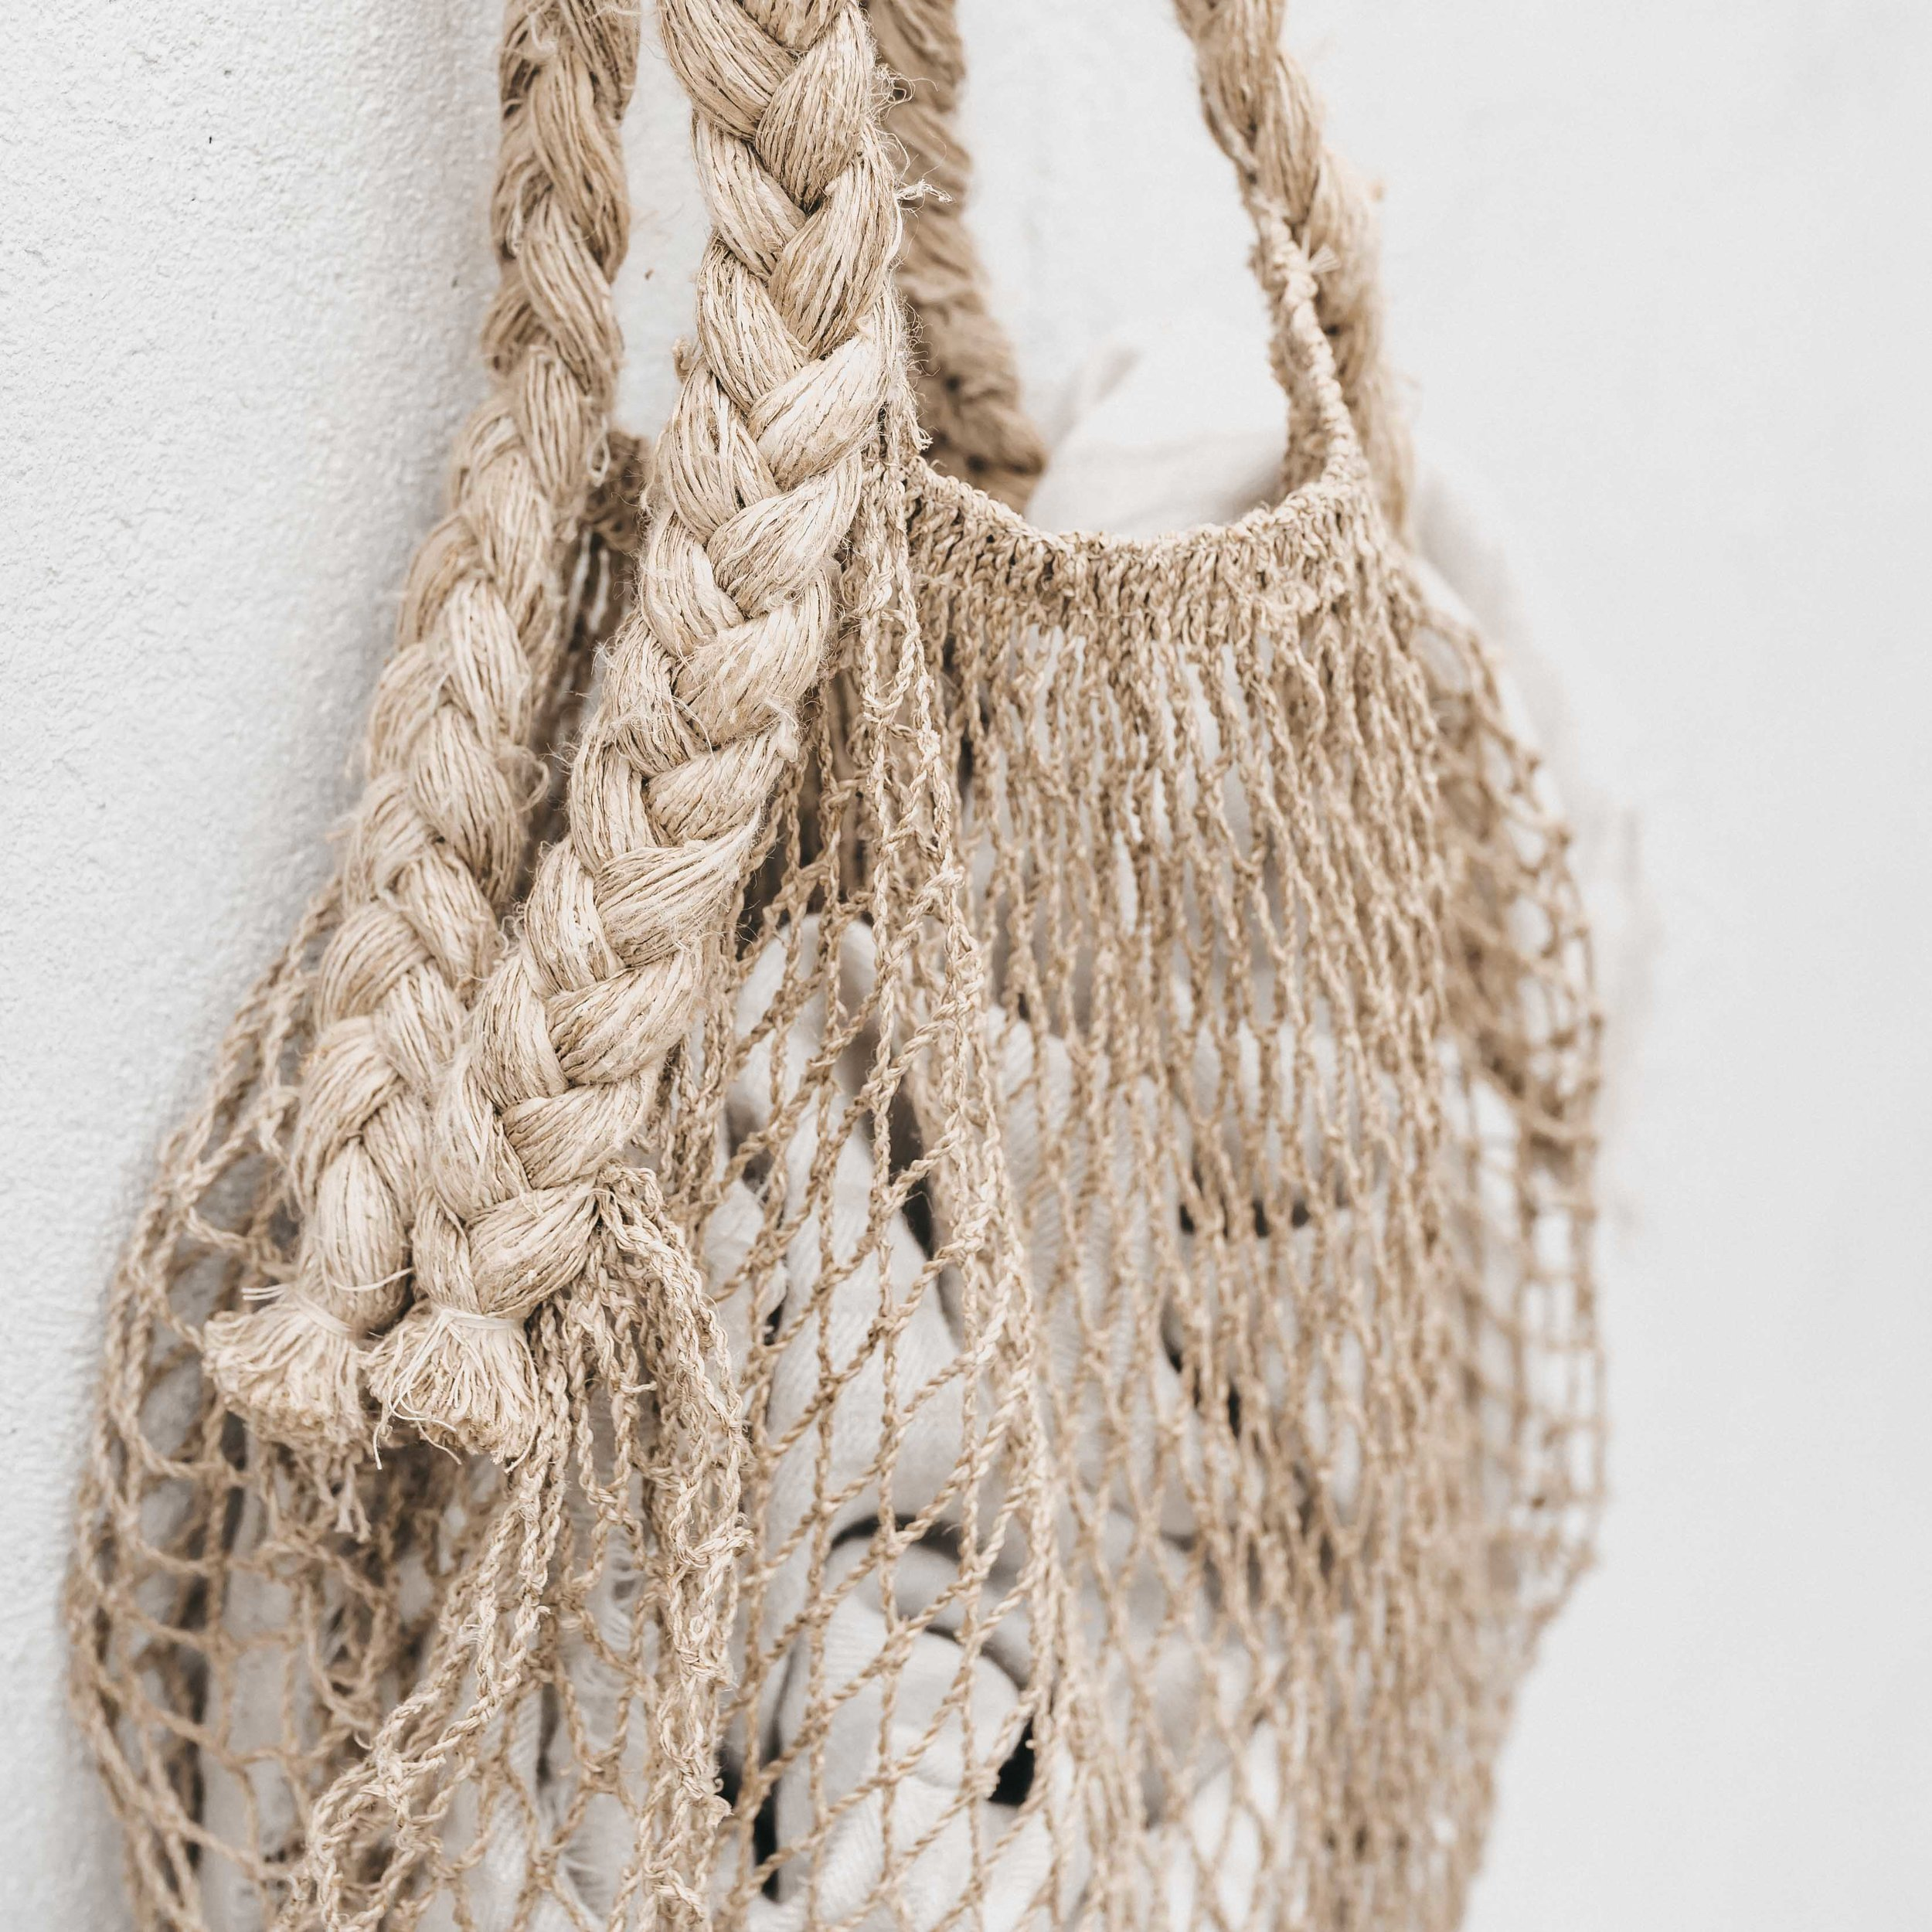 keira-mason-nowhere-and-everywhere-woven-bag.jpg